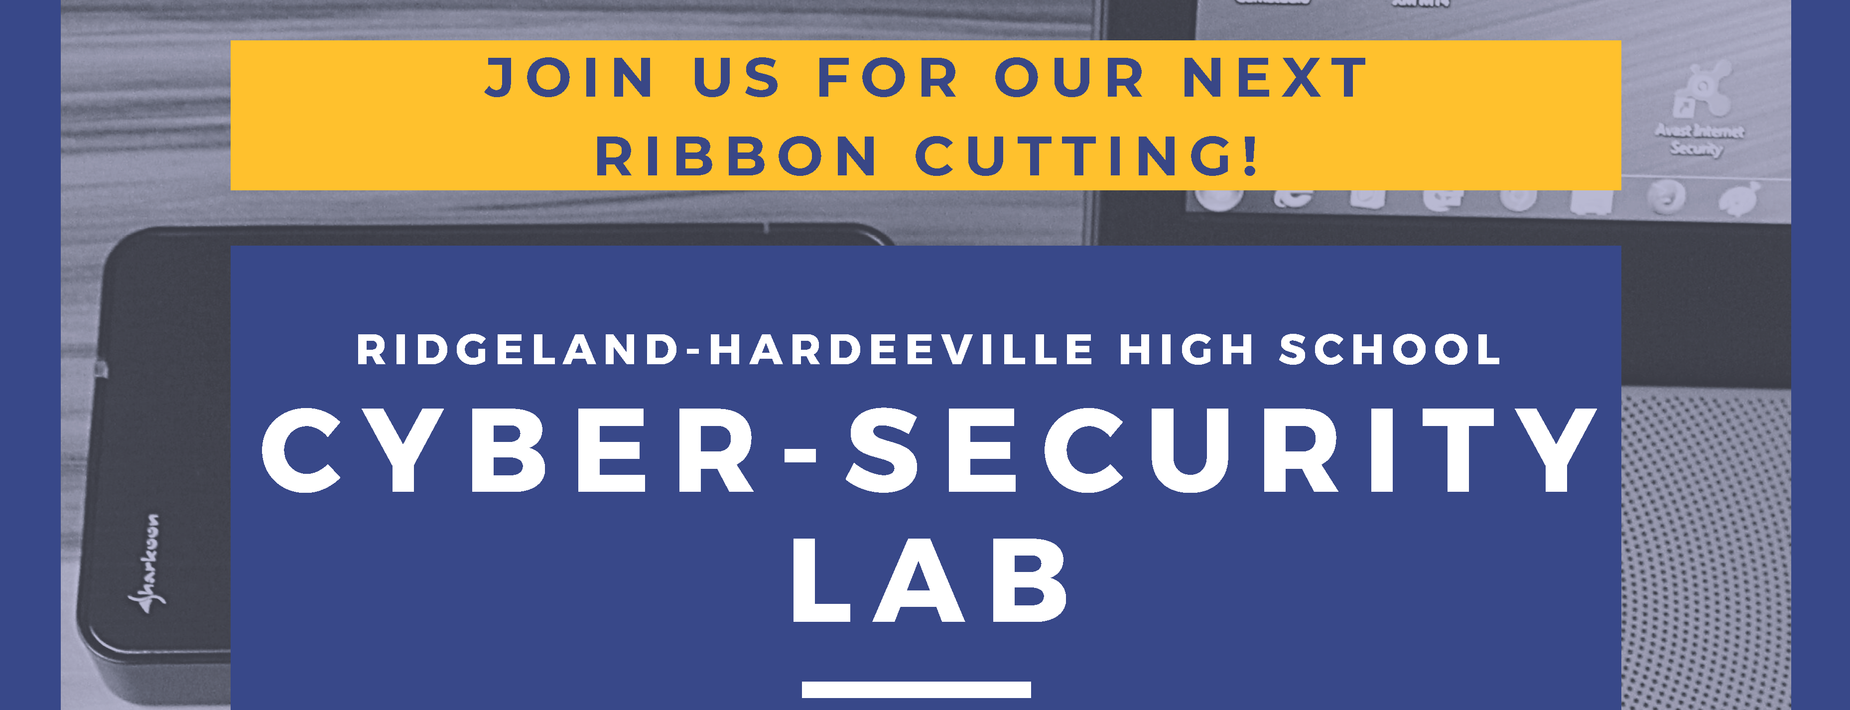 Cyber Security Lab Ribbon Cutting